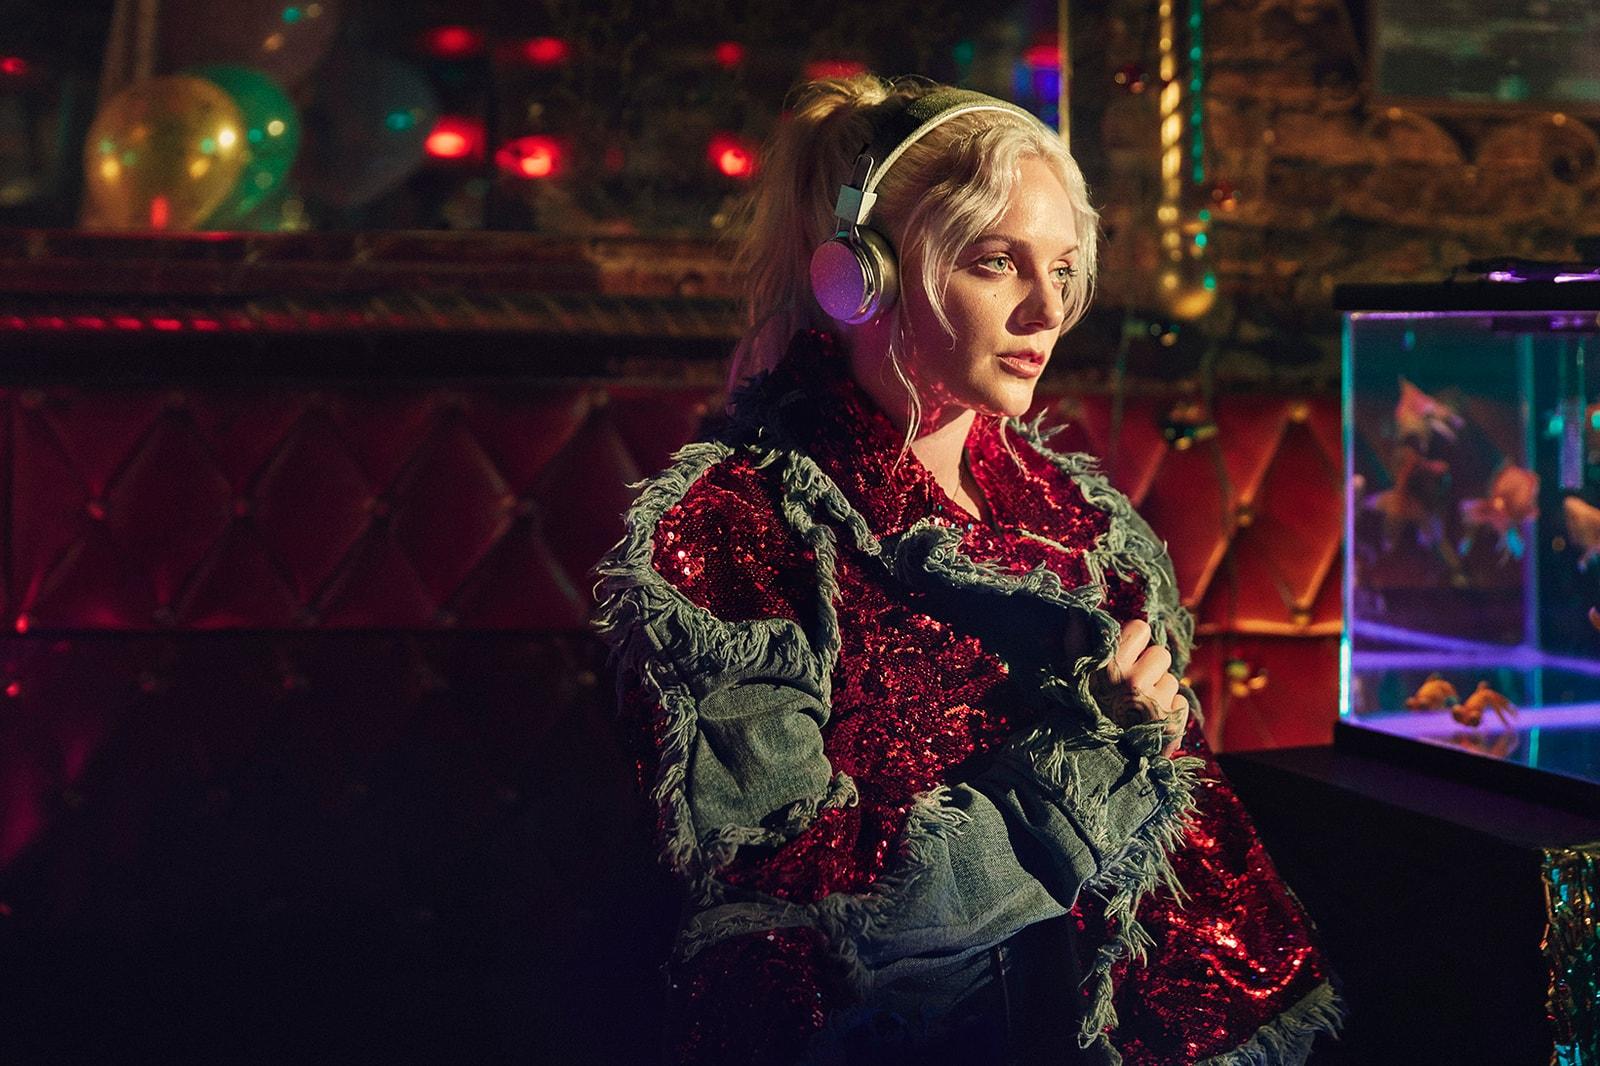 Tove Lo Interview Urbanears Collection New Album 2018